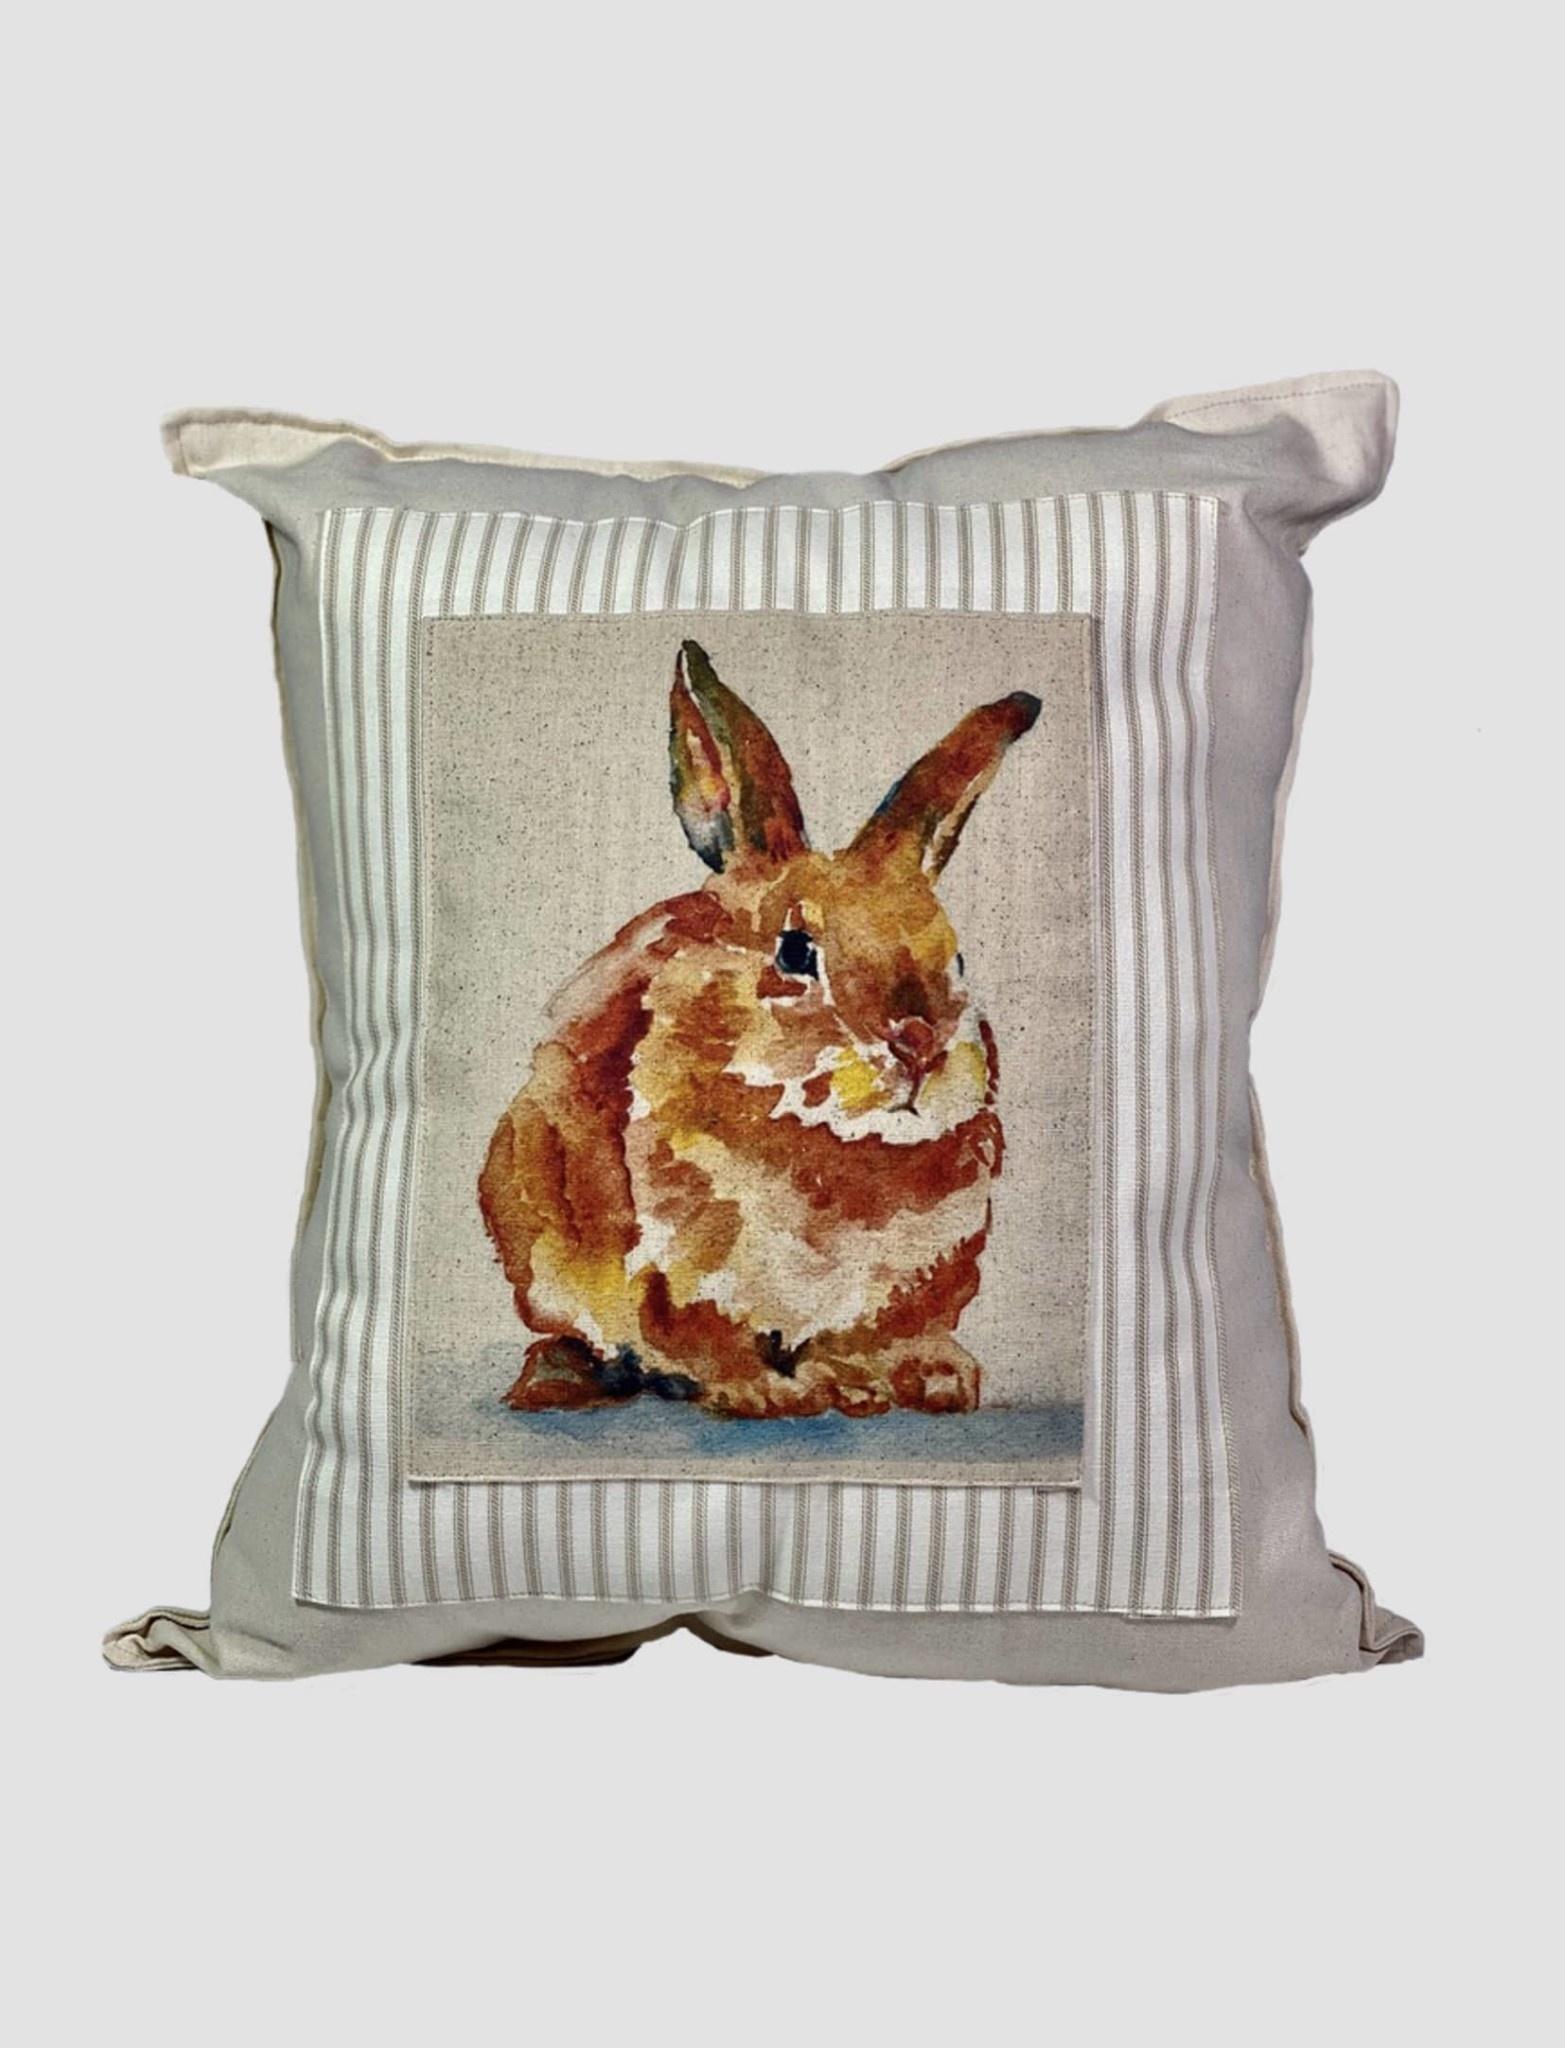 Nana's Farmhouse Bunny Pillow Tan Ticking